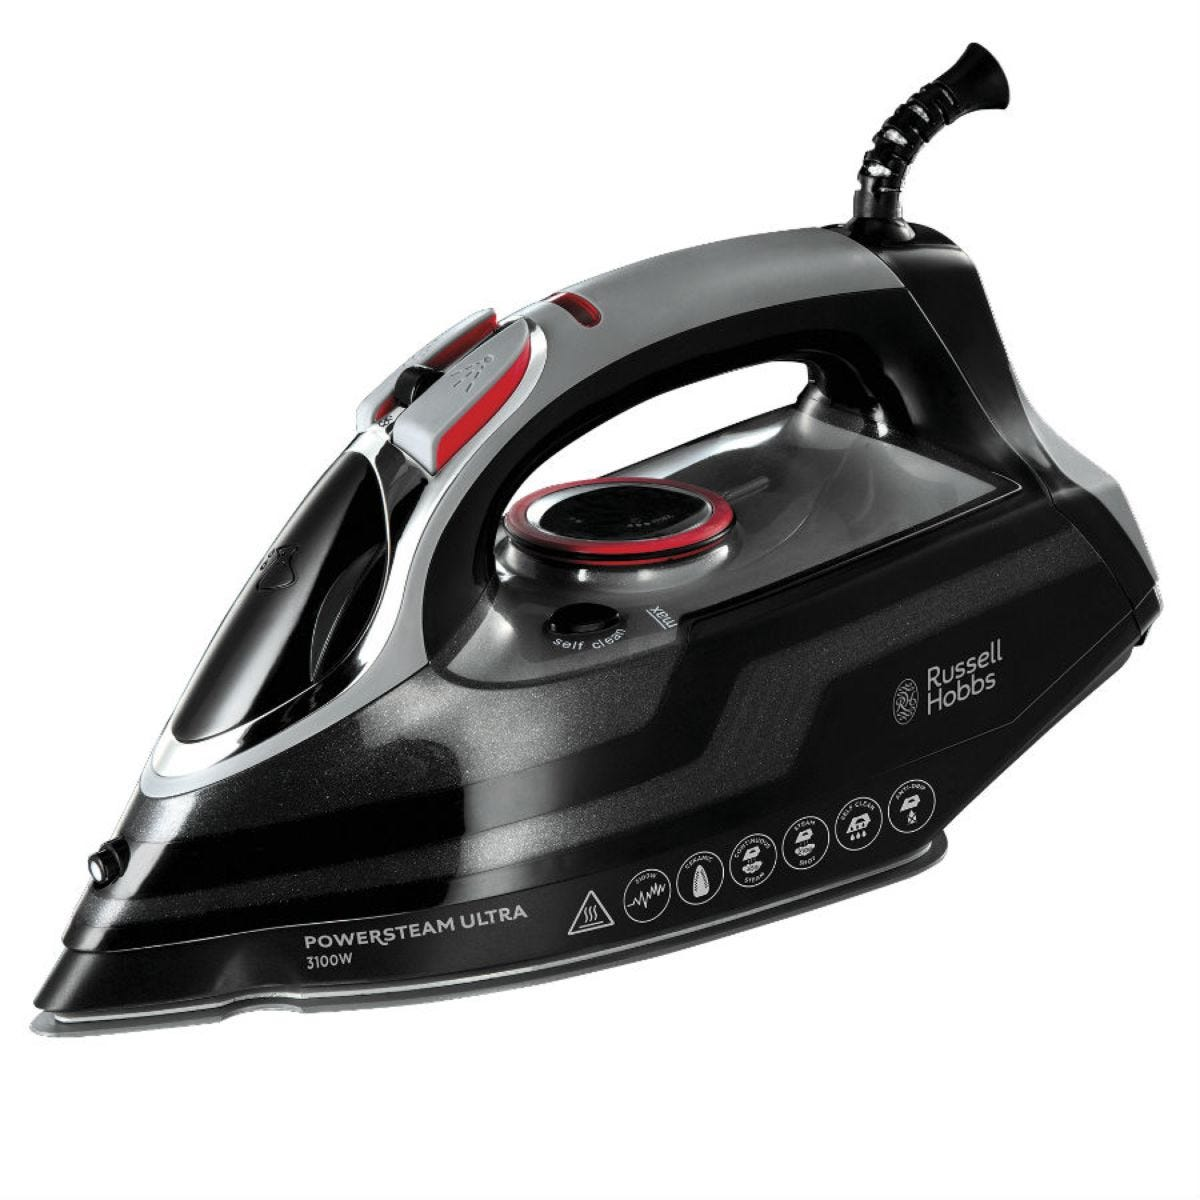 Russell Hobbs 20630 Powersteam Ultra 3100W Vertical Steam Iron - Black/Silver/Red